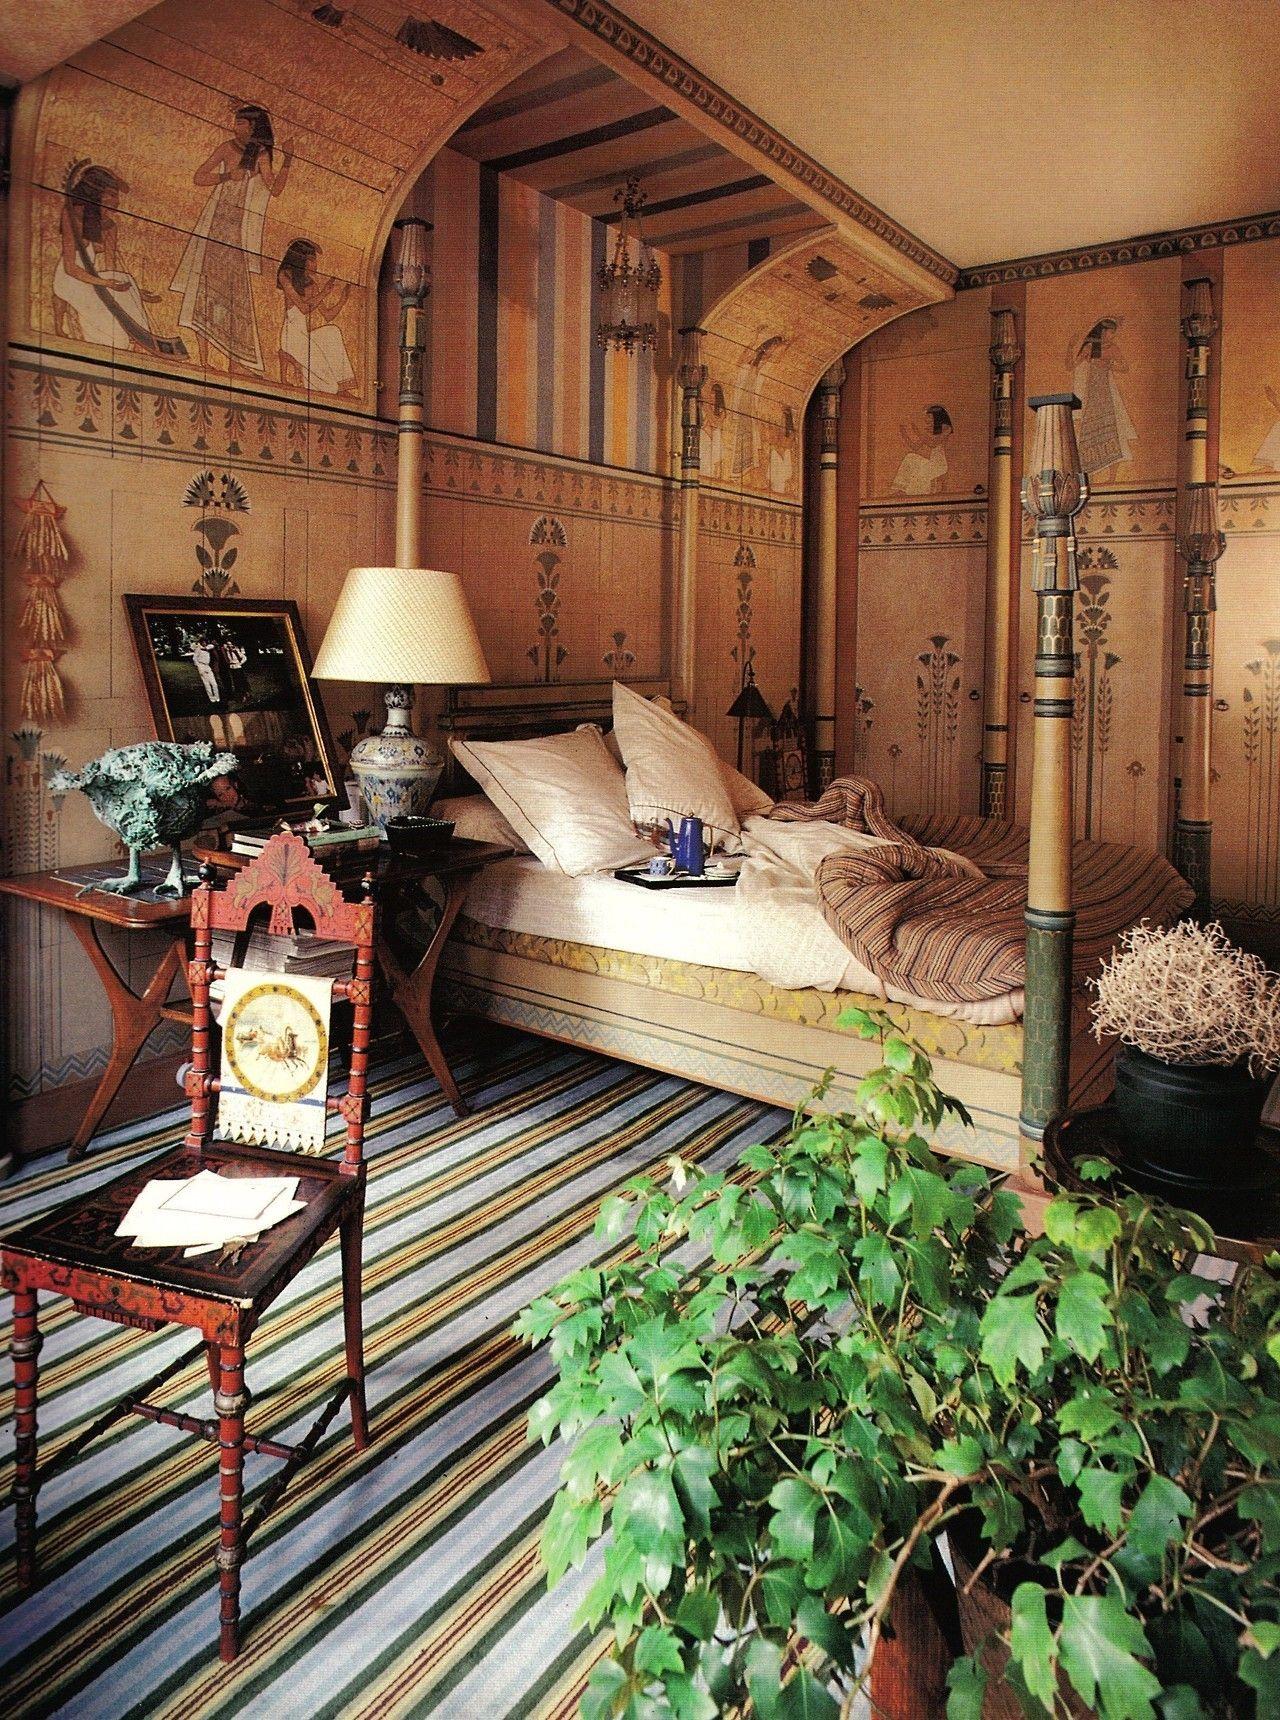 haute boheme livesunique Jacques Grange Interior Design